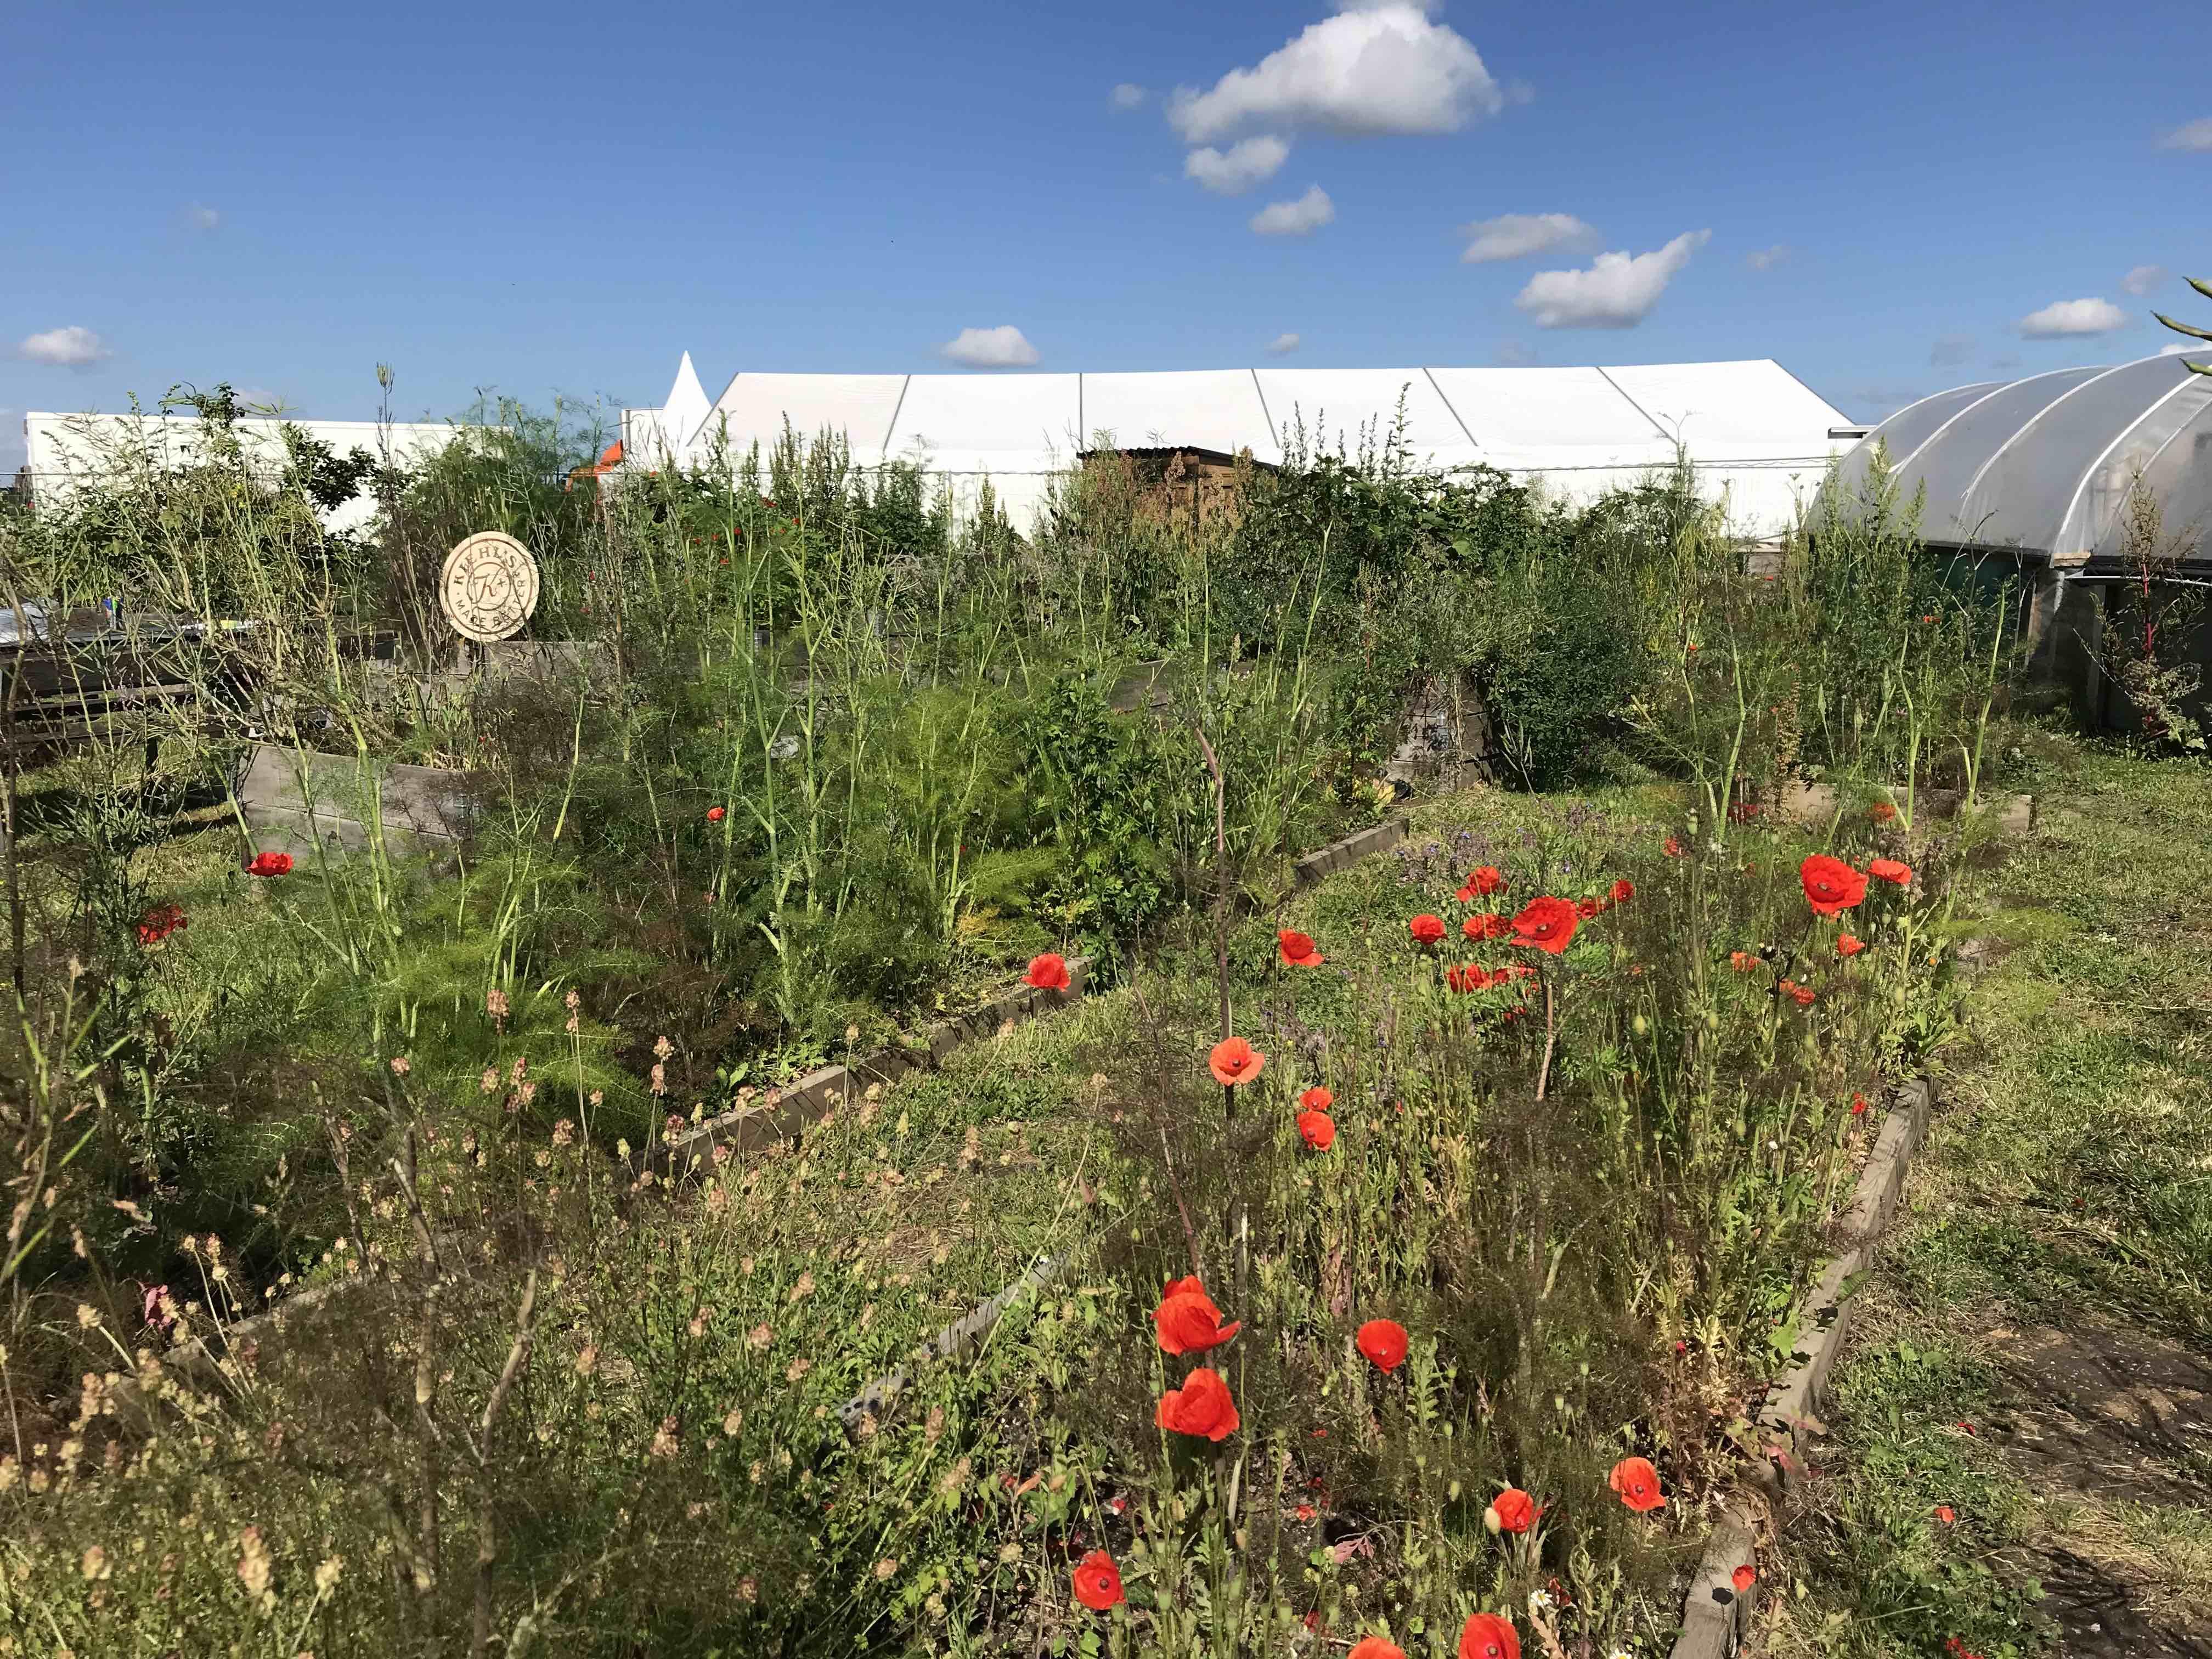 have, urban gardening, blomster, urter, planter